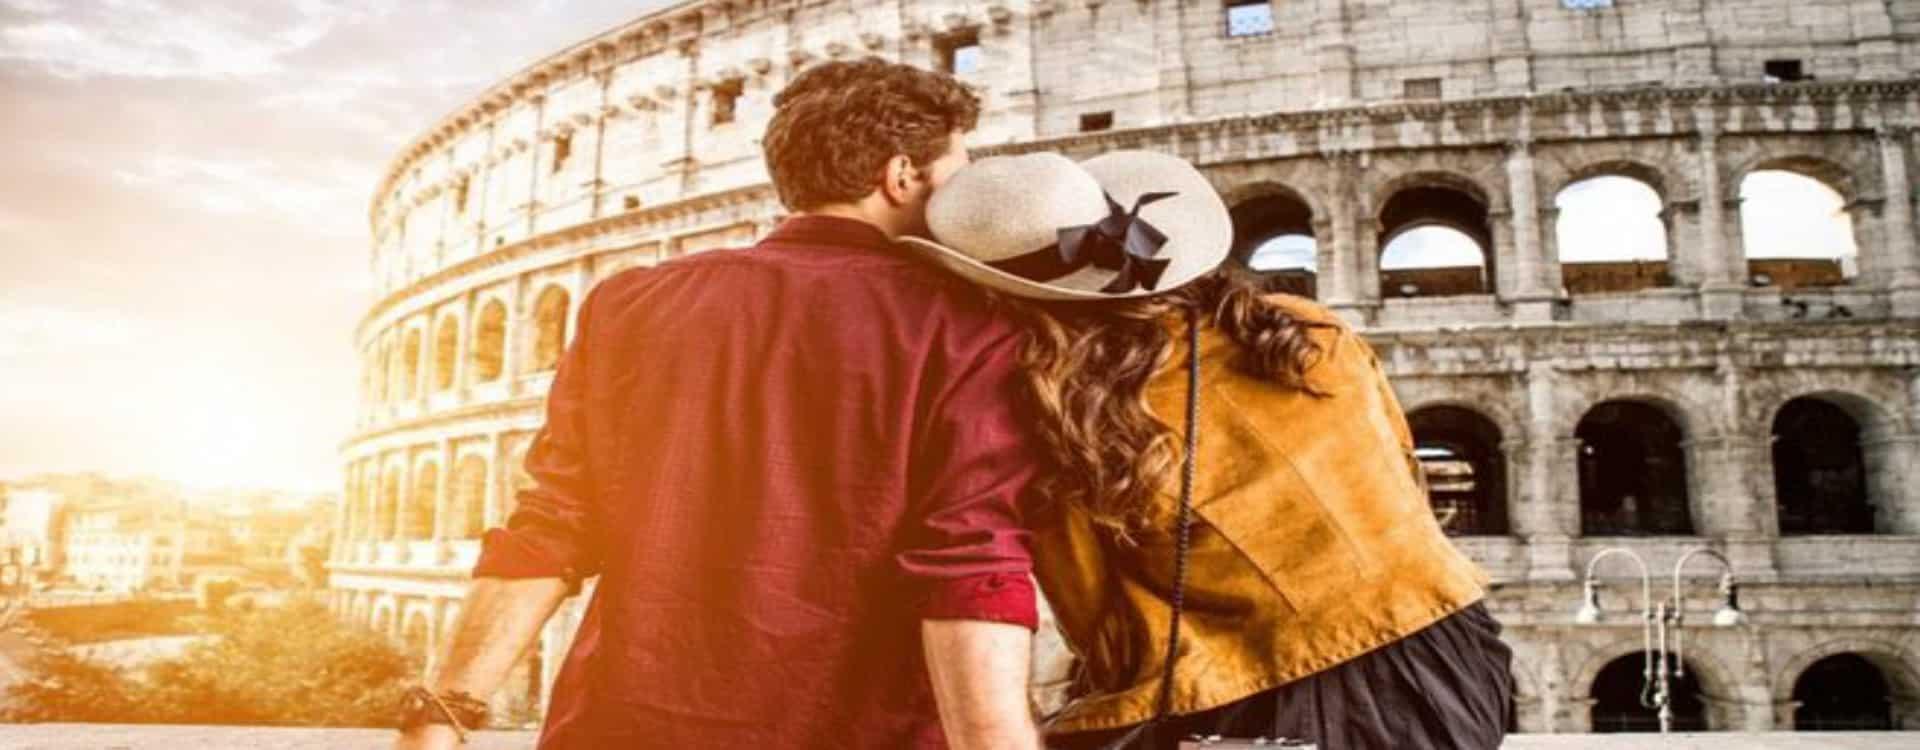 Escapada Romántica a Roma - Paquete turístico 2 personas